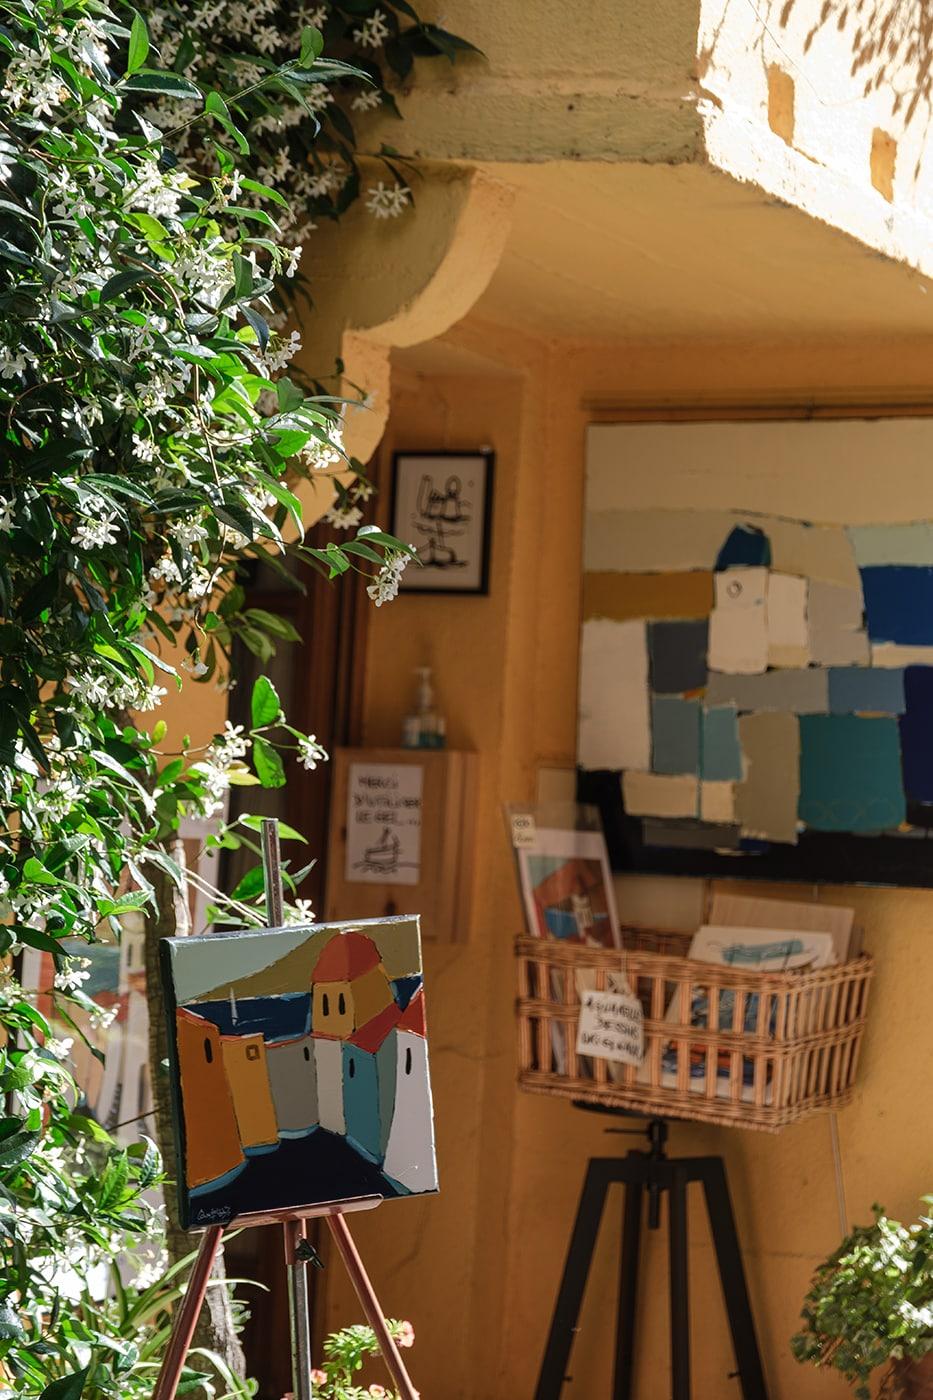 Galerie d'art à Collioure